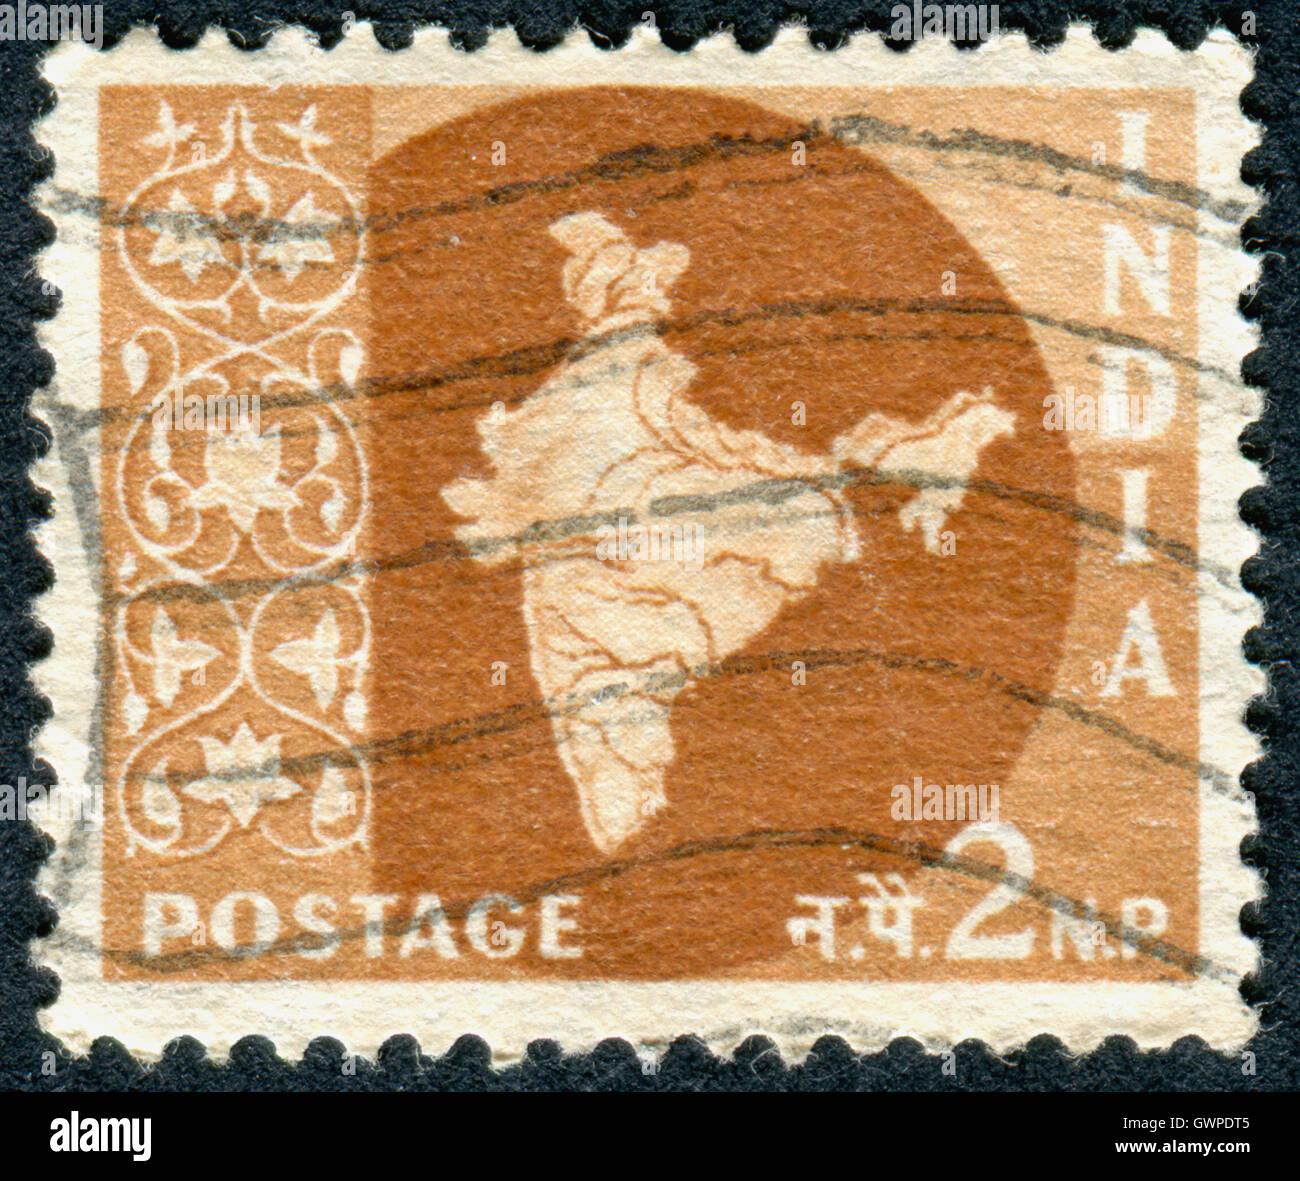 Postage Stamp India Stock Photos & Postage Stamp India ...